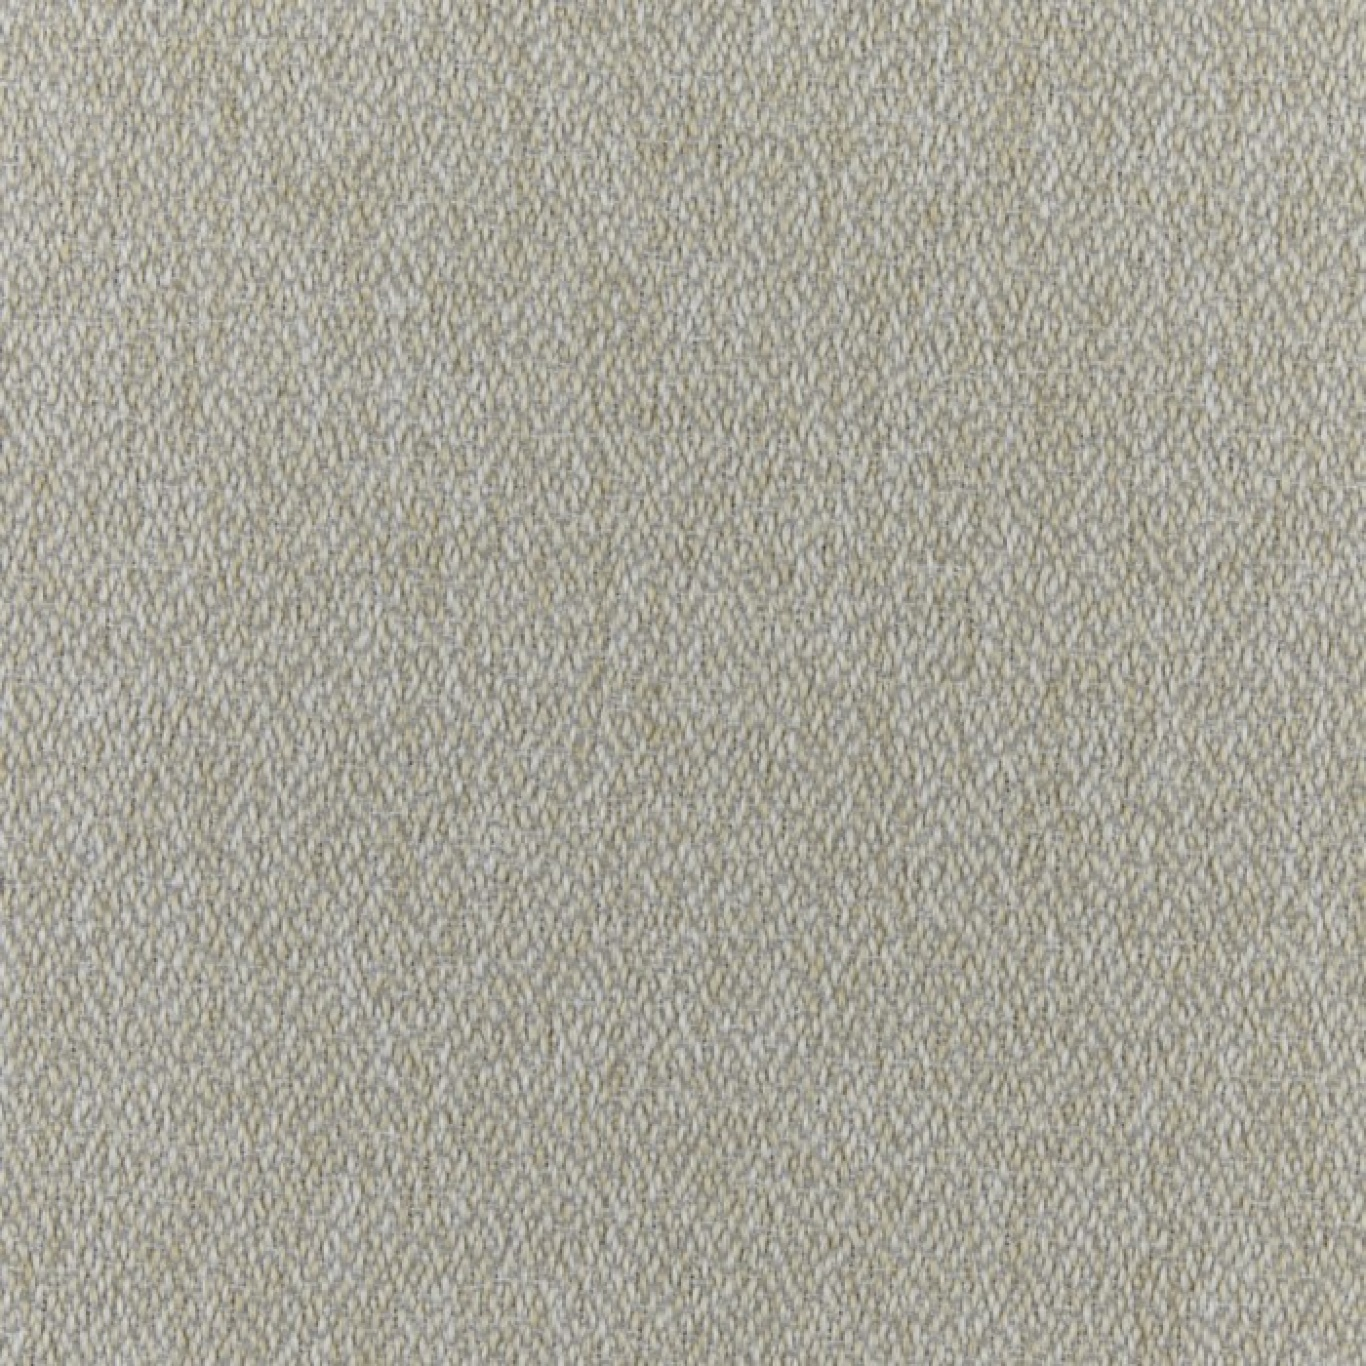 Image of Prestigious Harrison Pebble Fabric